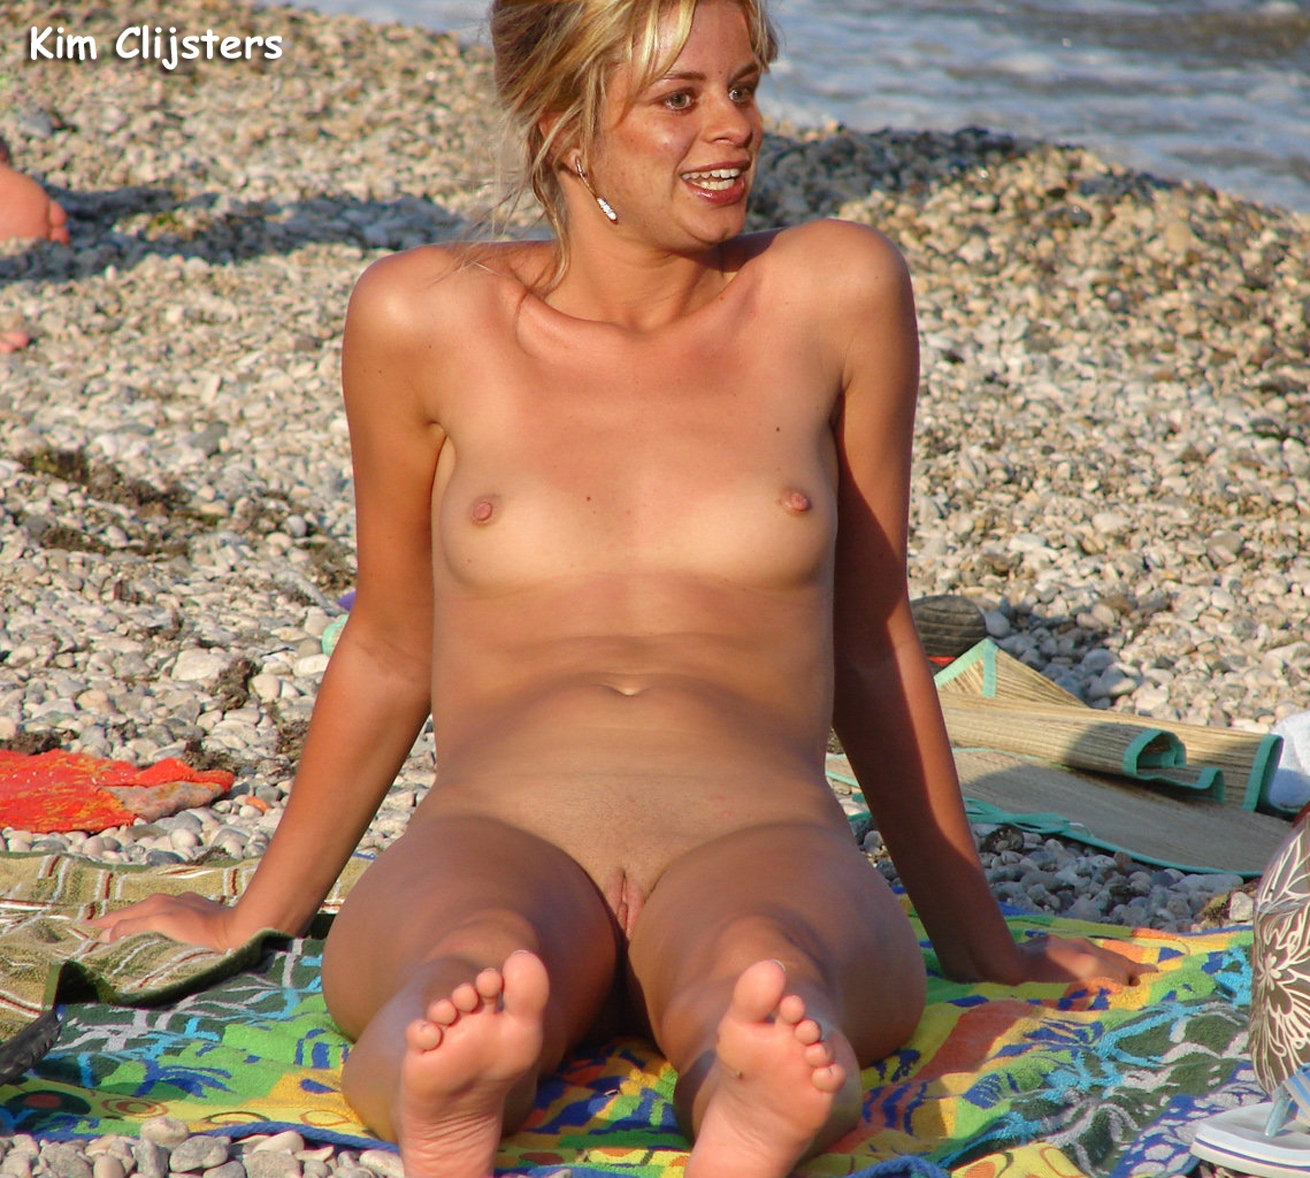 Kim clijsters nude fake